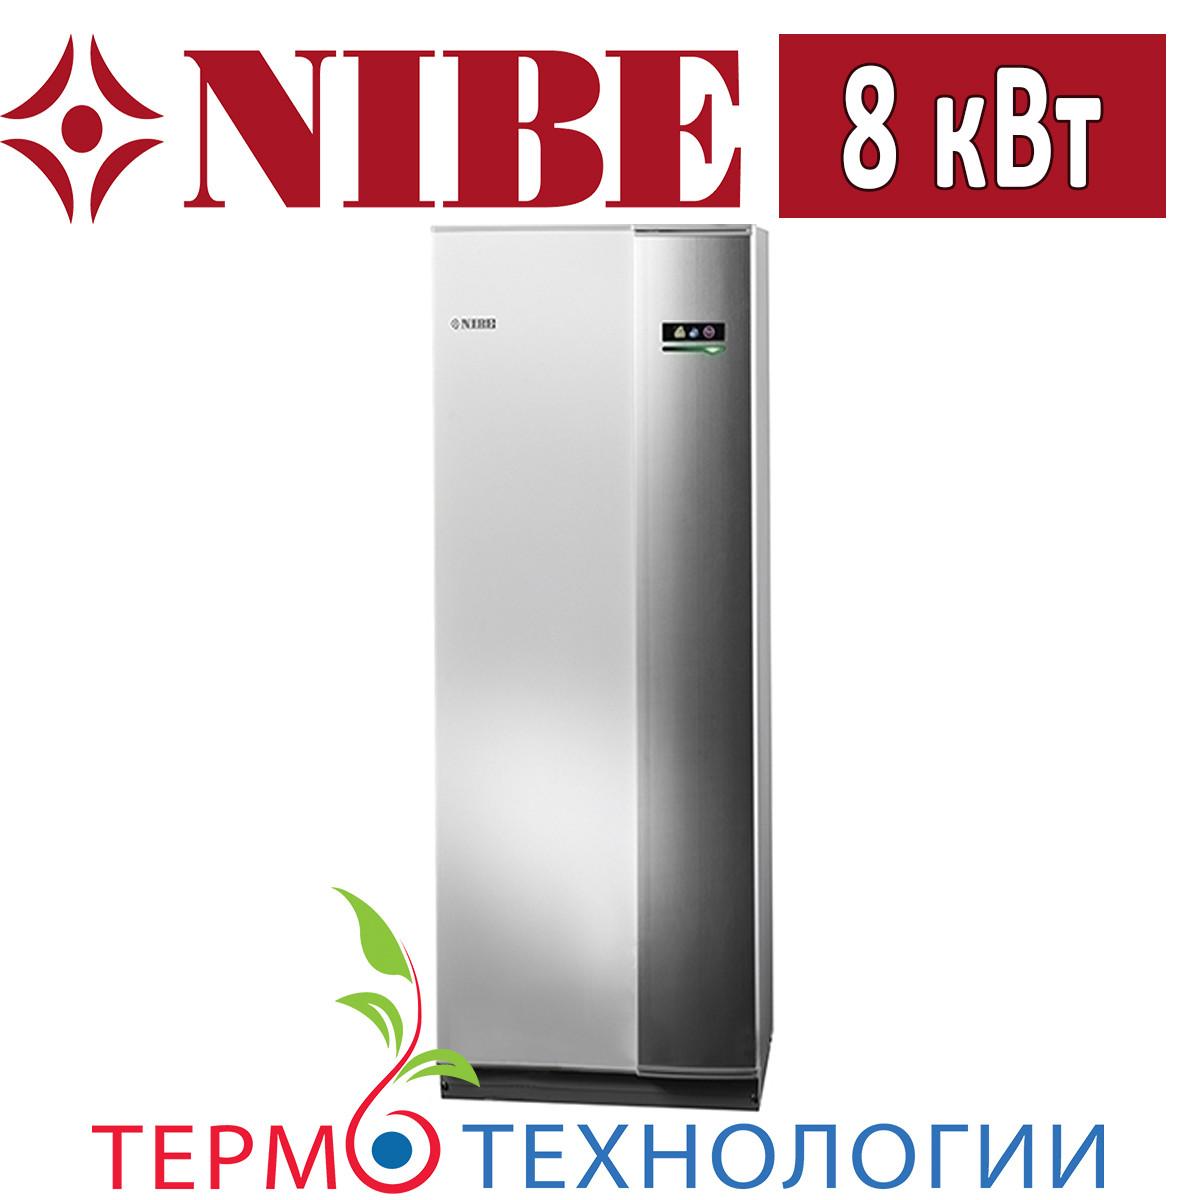 Тепловой насос грунт-вода Nibe F1245-8 R 8 кВт, 230 В